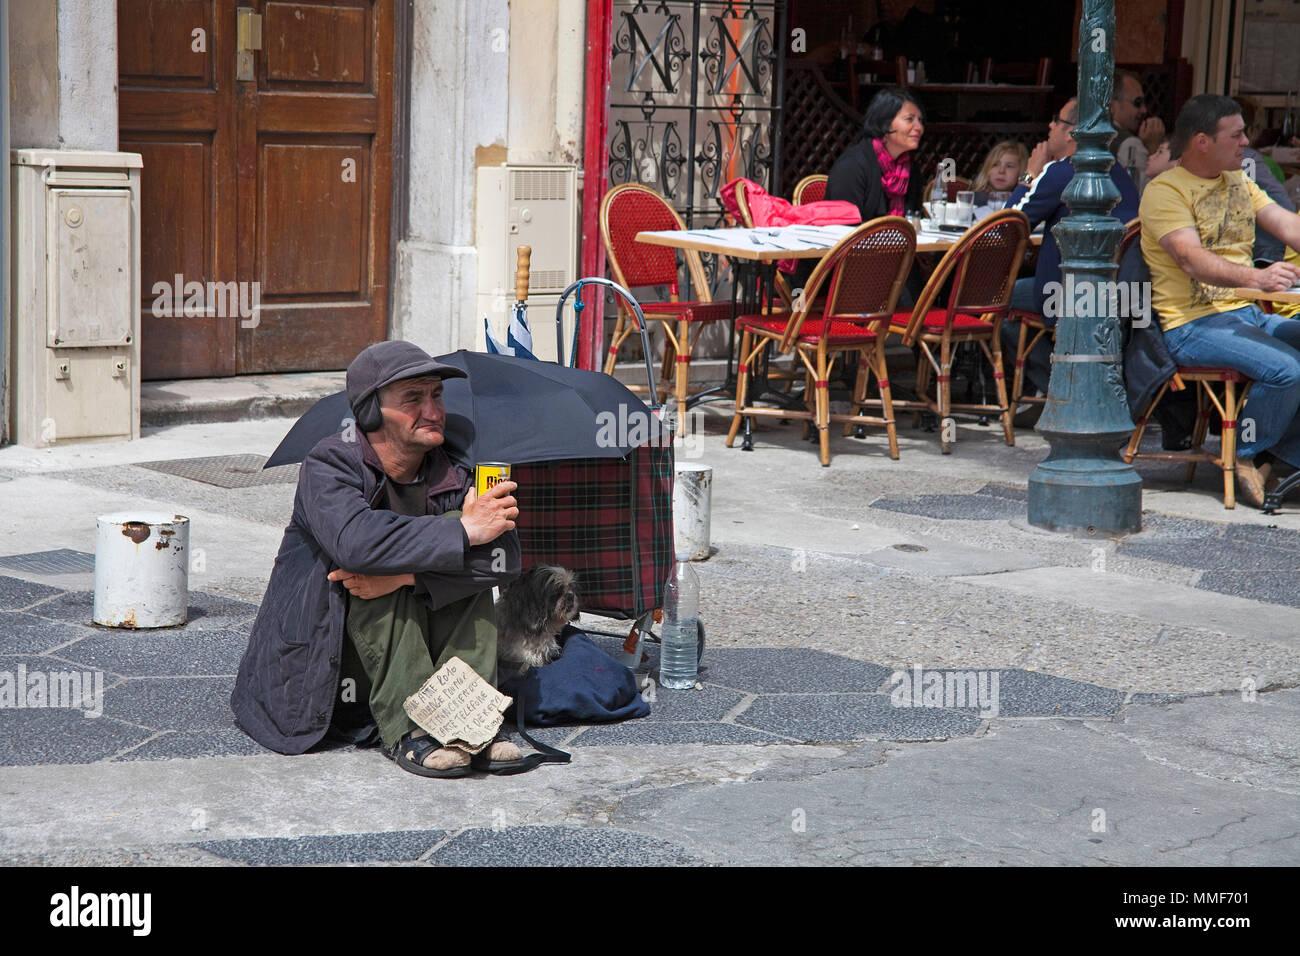 Beggar at a street cafe Nice, Côte d'Azur, Alpes-Maritimes, South France, France, Europe - Stock Image